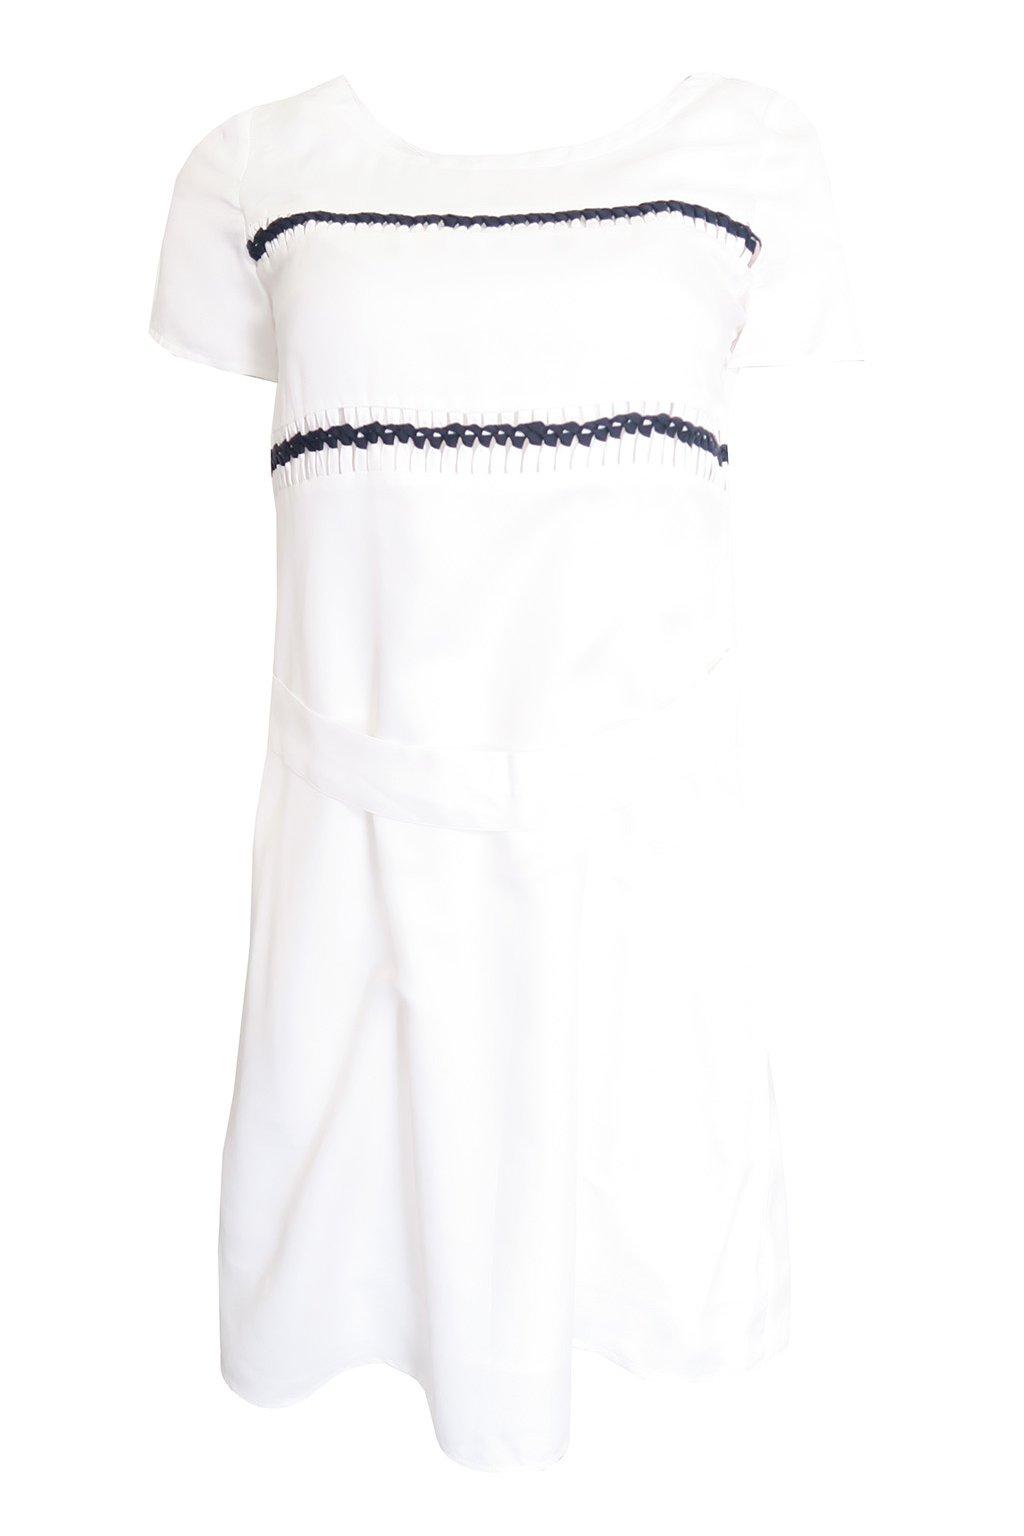 Bílé zdobené šaty Kookai